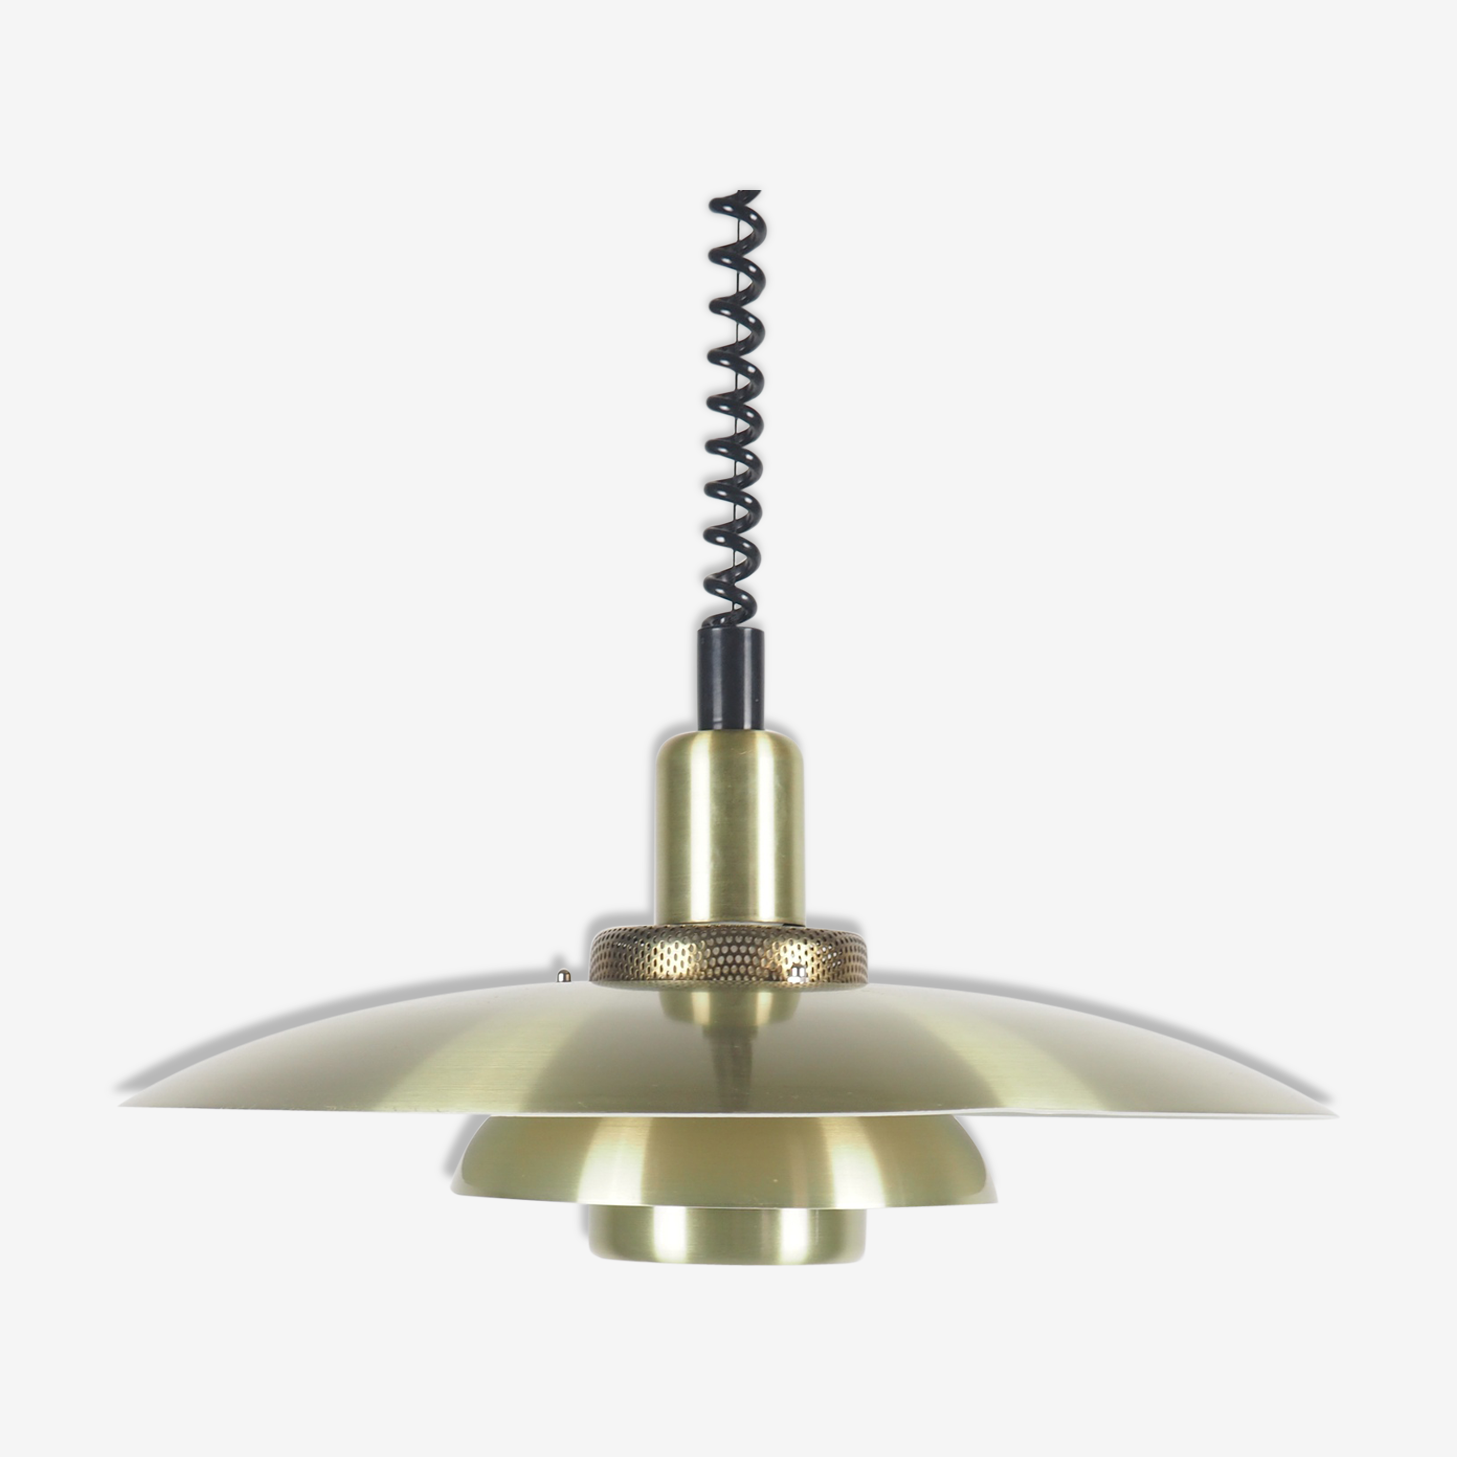 Danish brass metal hanging lamp from Lyskaer, 1970